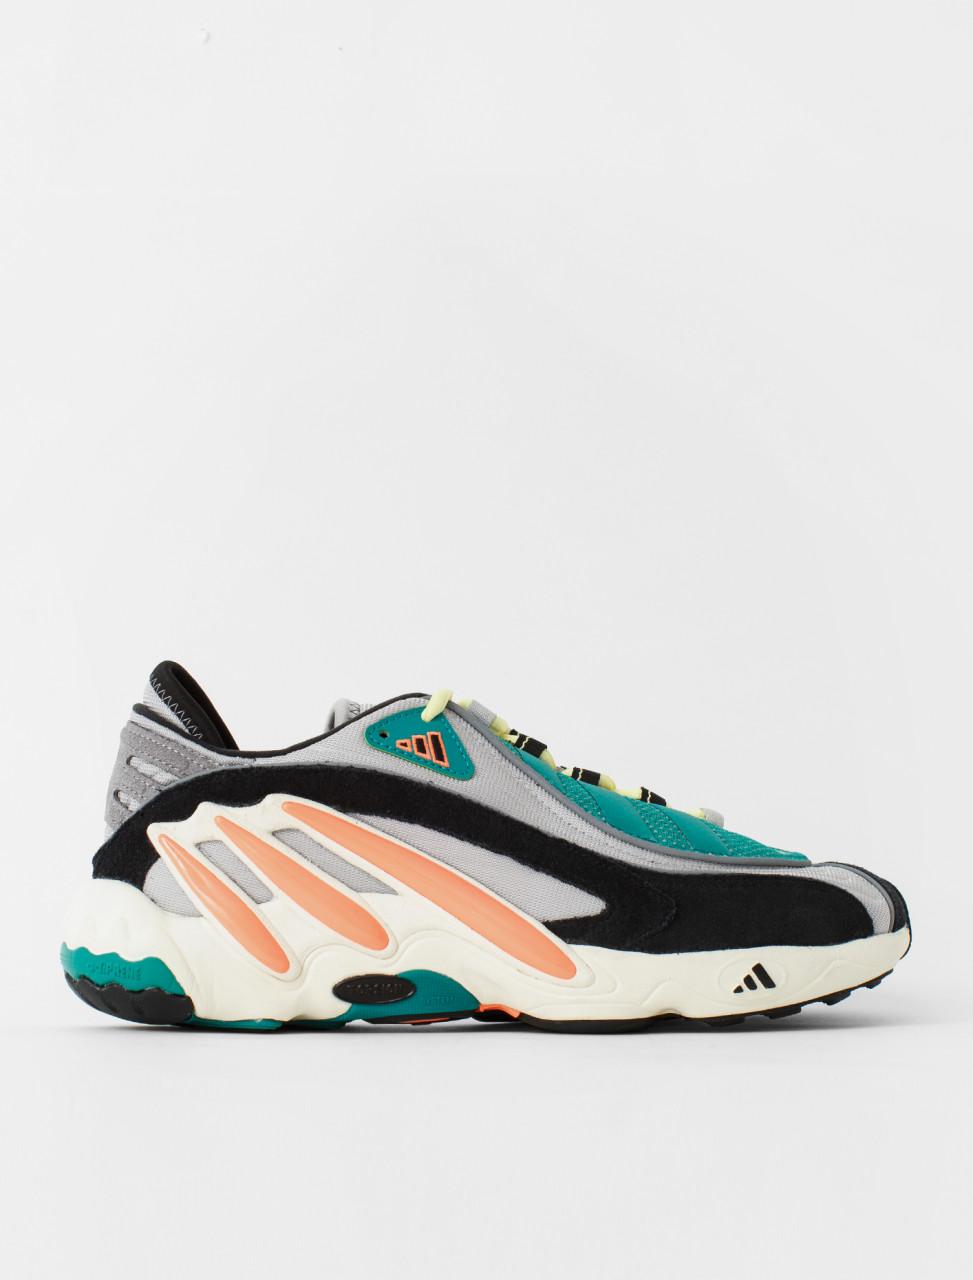 Adidas FYW 98 Sneaker